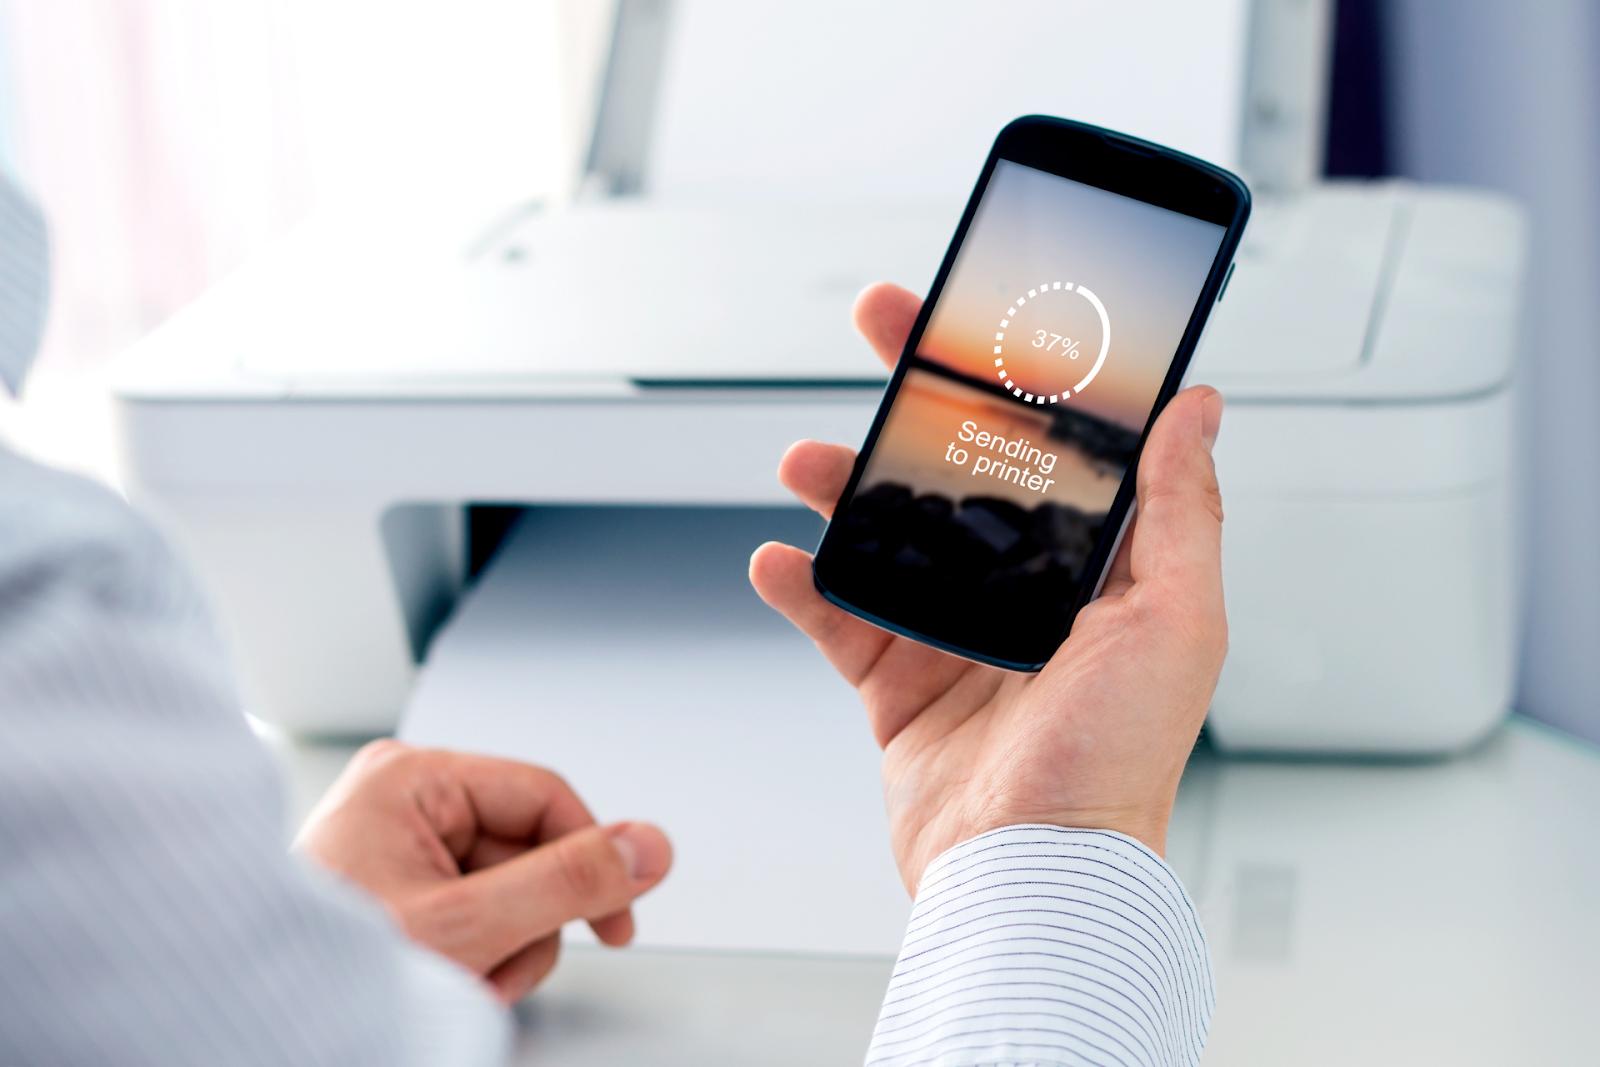 A mobile device sends a printing job wirelessly to a printer